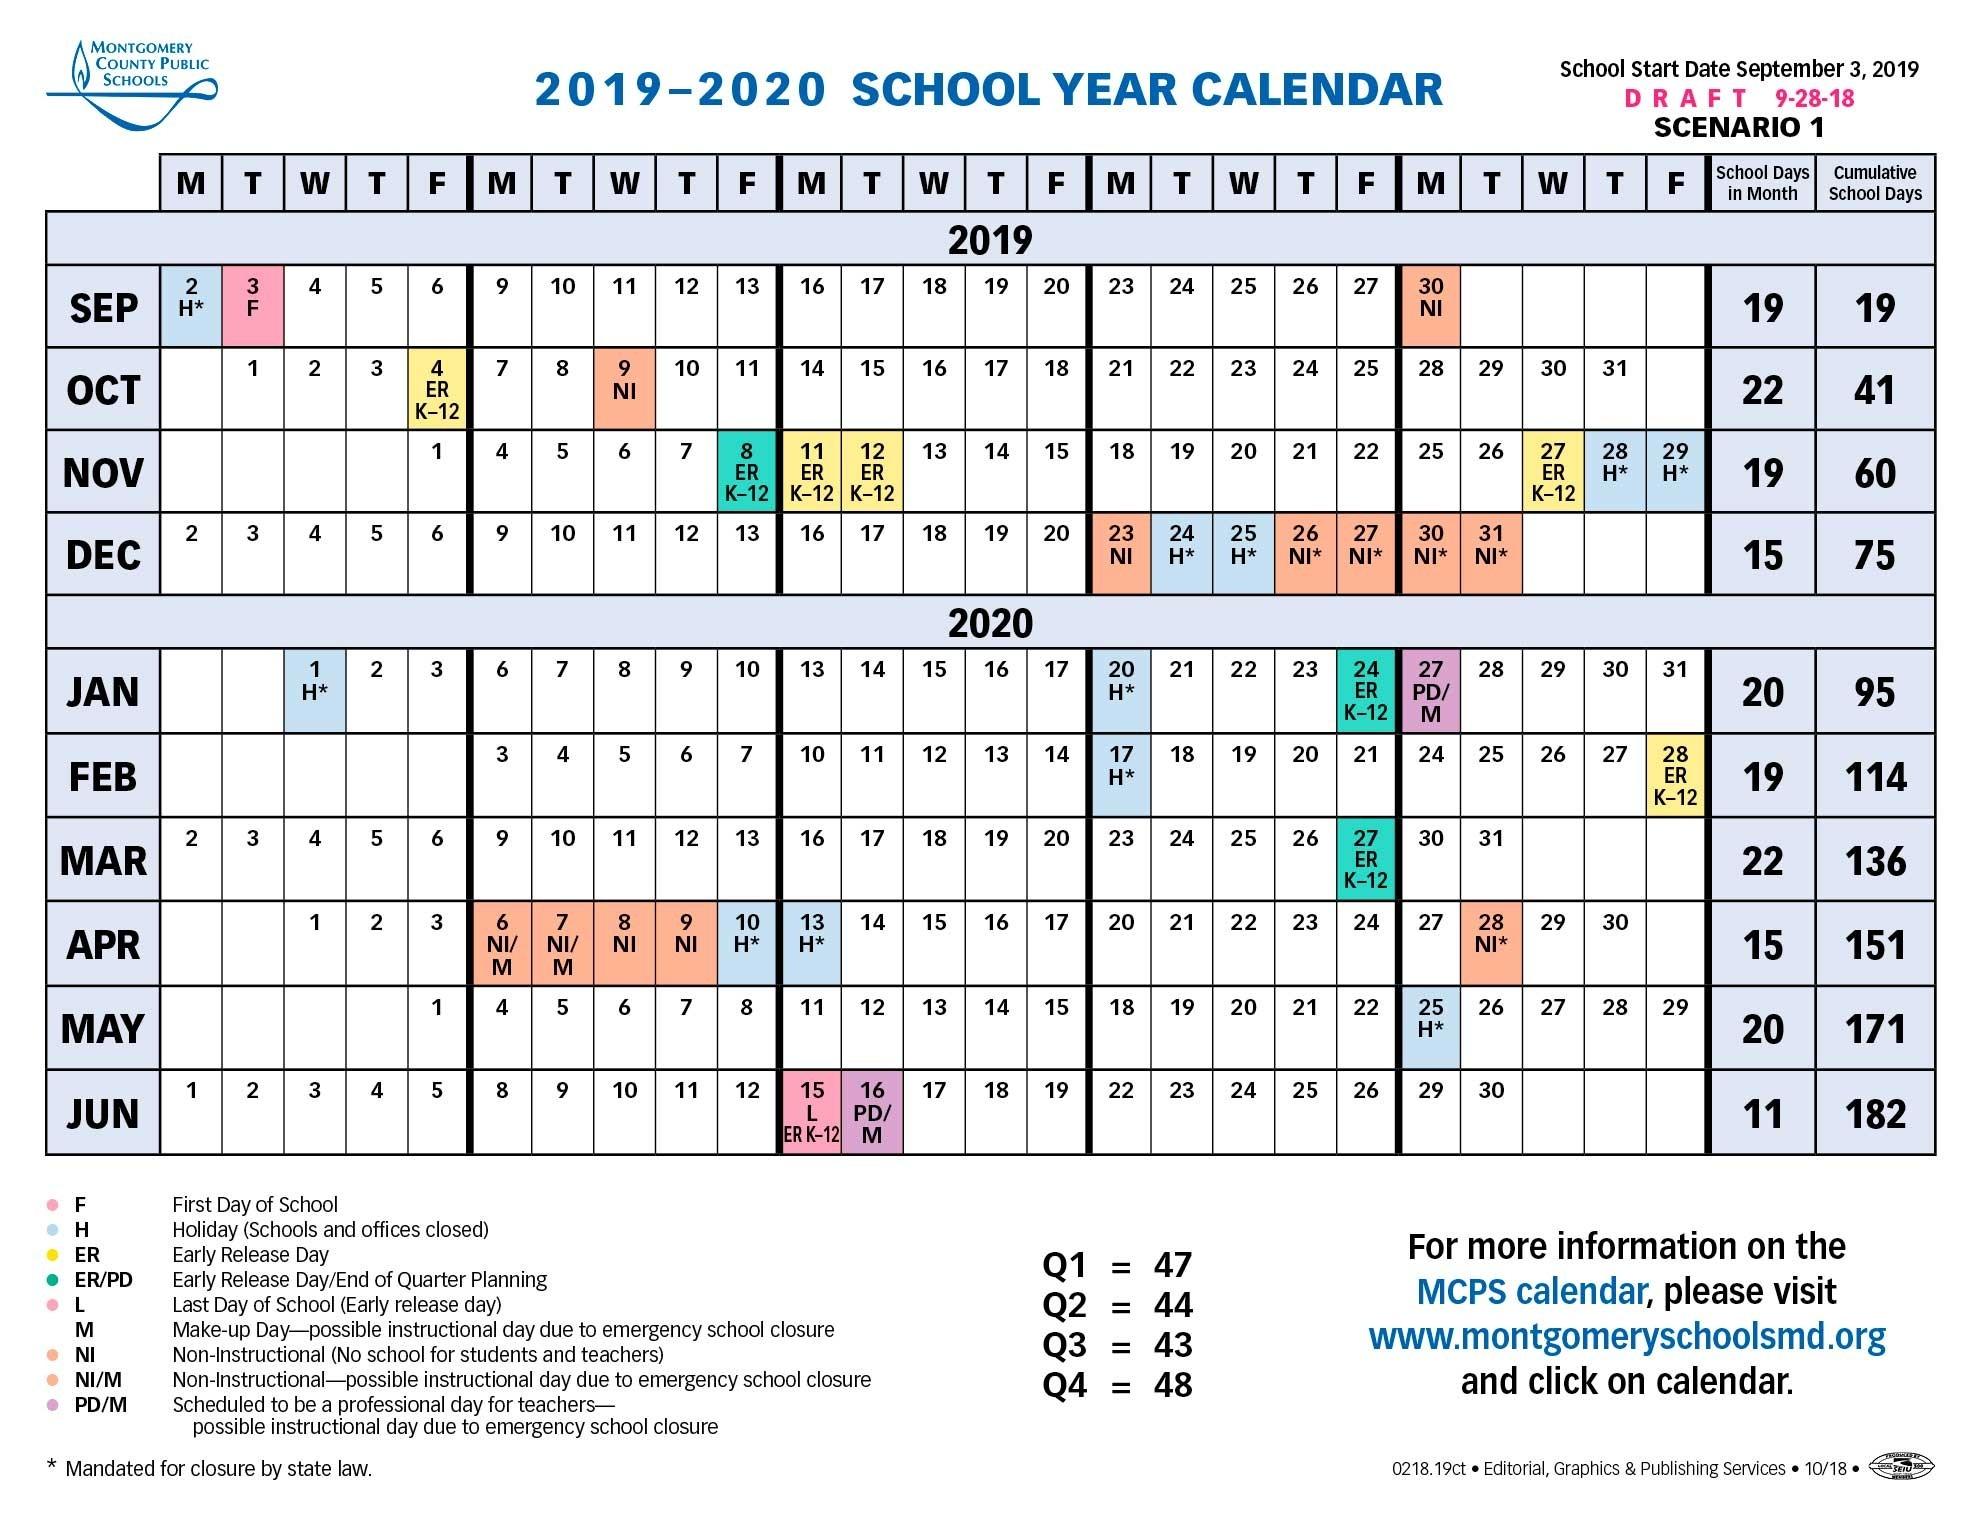 School Board Approves Longer Spring Break For 2019-2020-January 2020 Hebrew Calendar